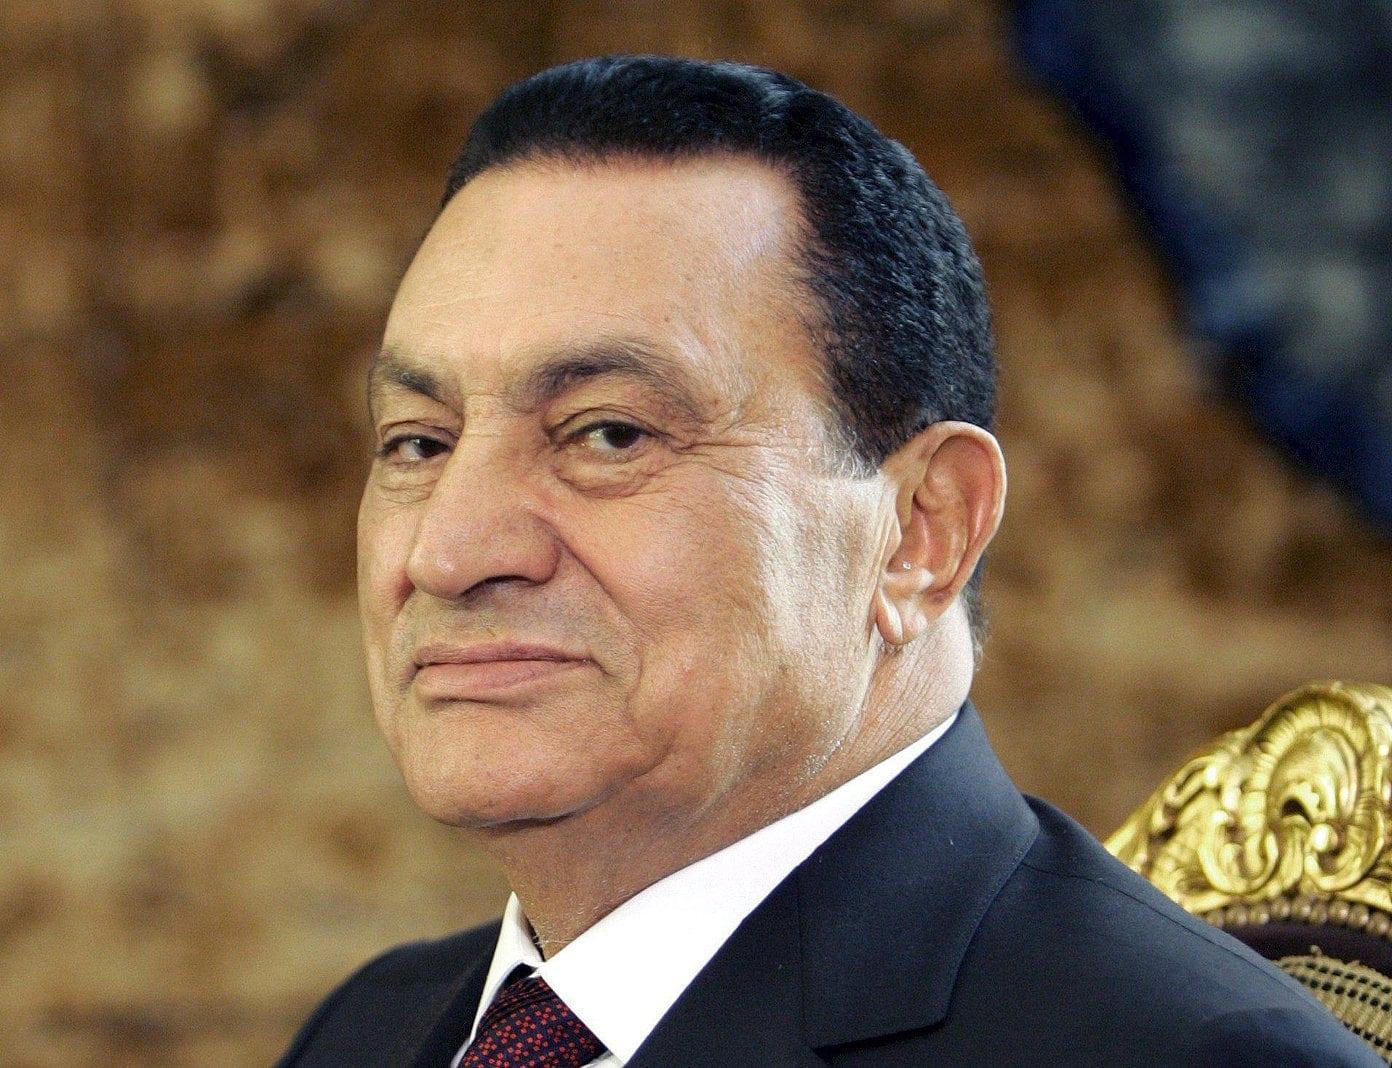 Ägyptens Ex-Machthaber Husni Mubarak gestorben